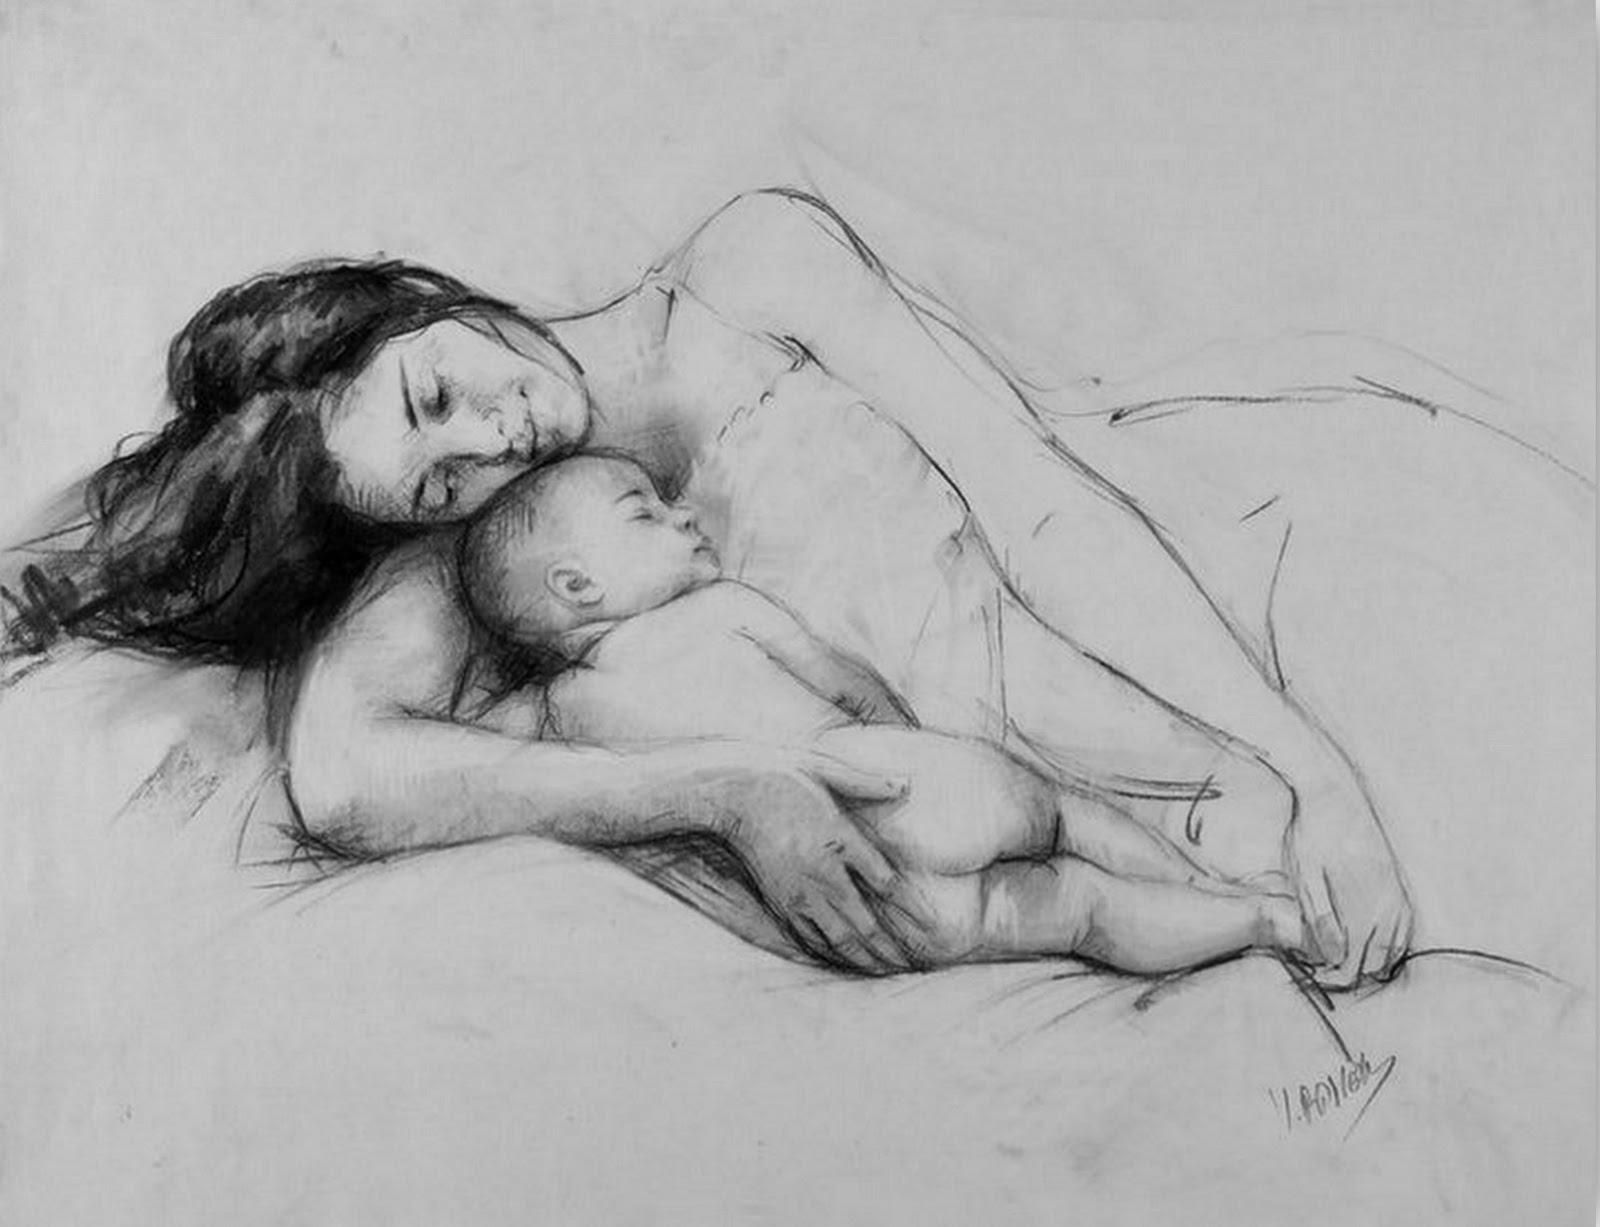 dibujo-a-lapiz-de-mujer-con-bebe